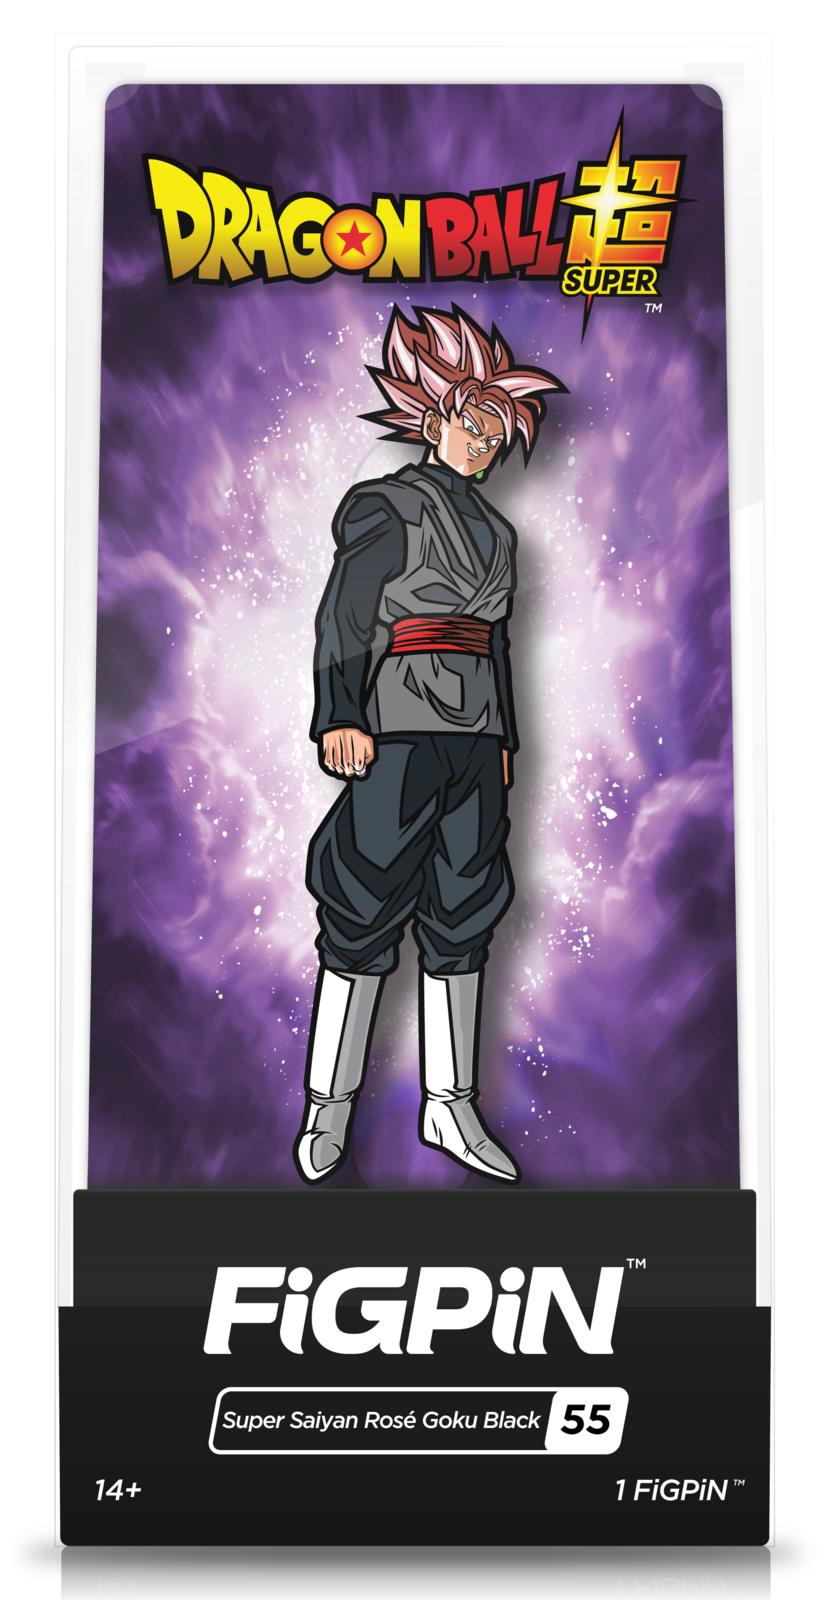 Dragon Ball Super: SS Rose Goku Black (#55) - FiGPiN image